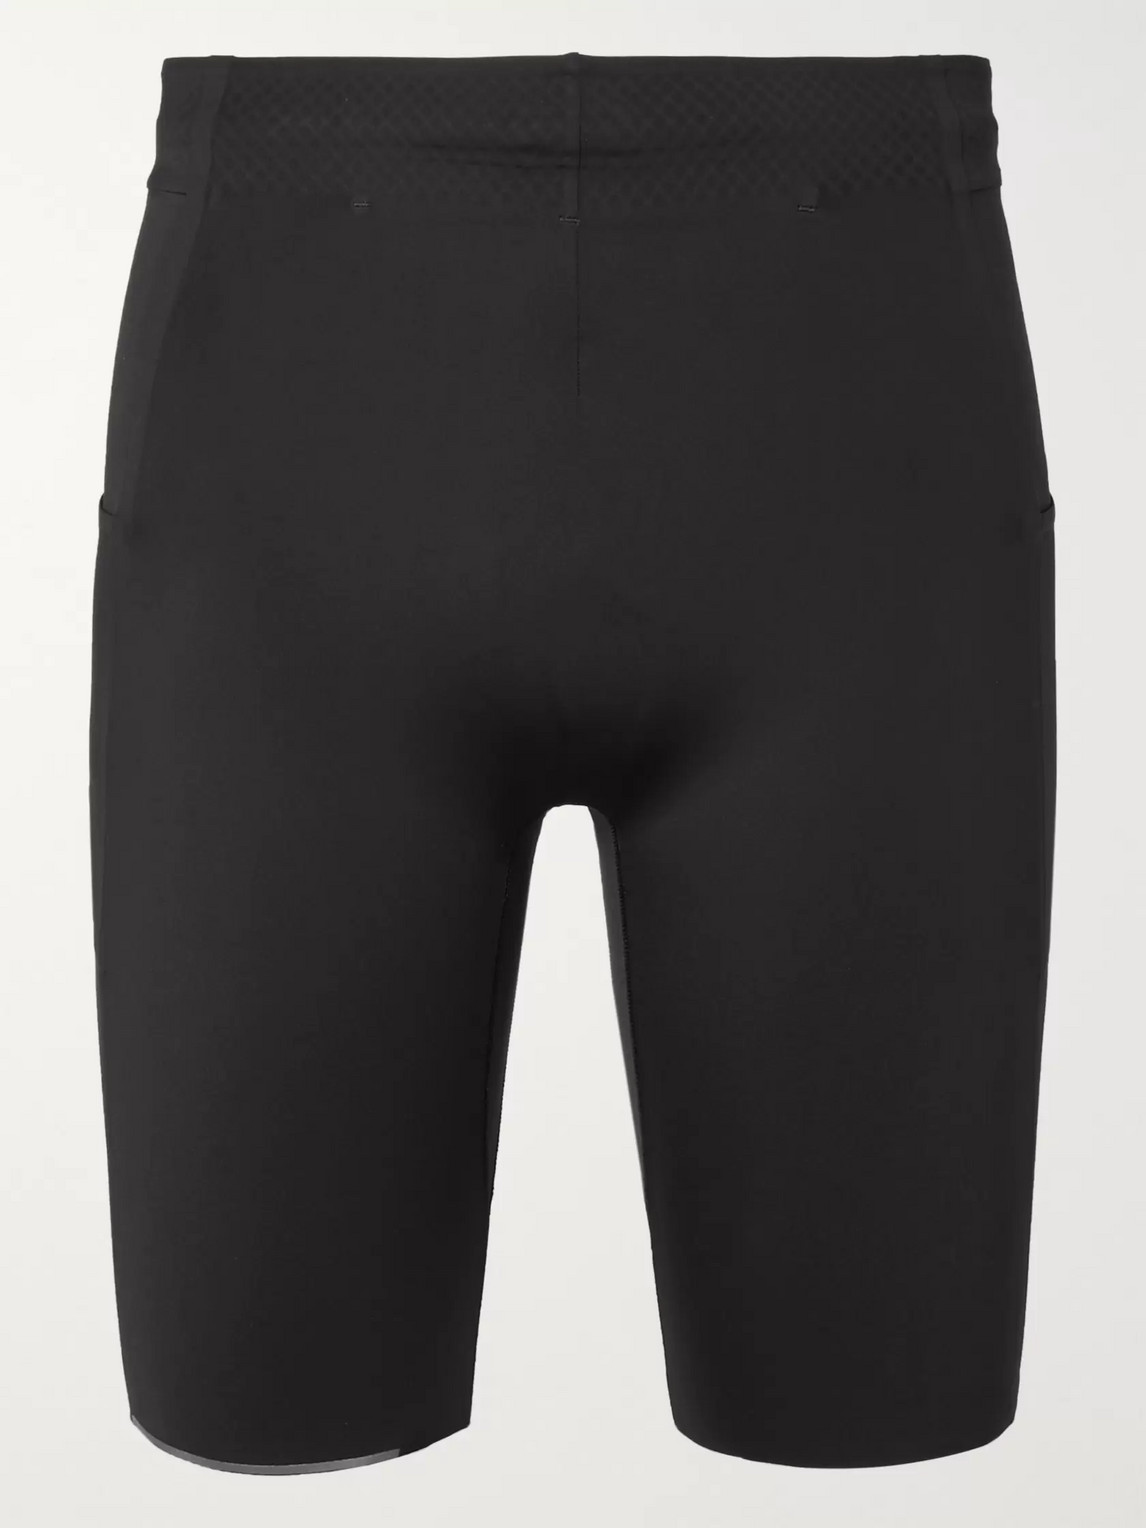 lululemon - draft zone shorts - men - black